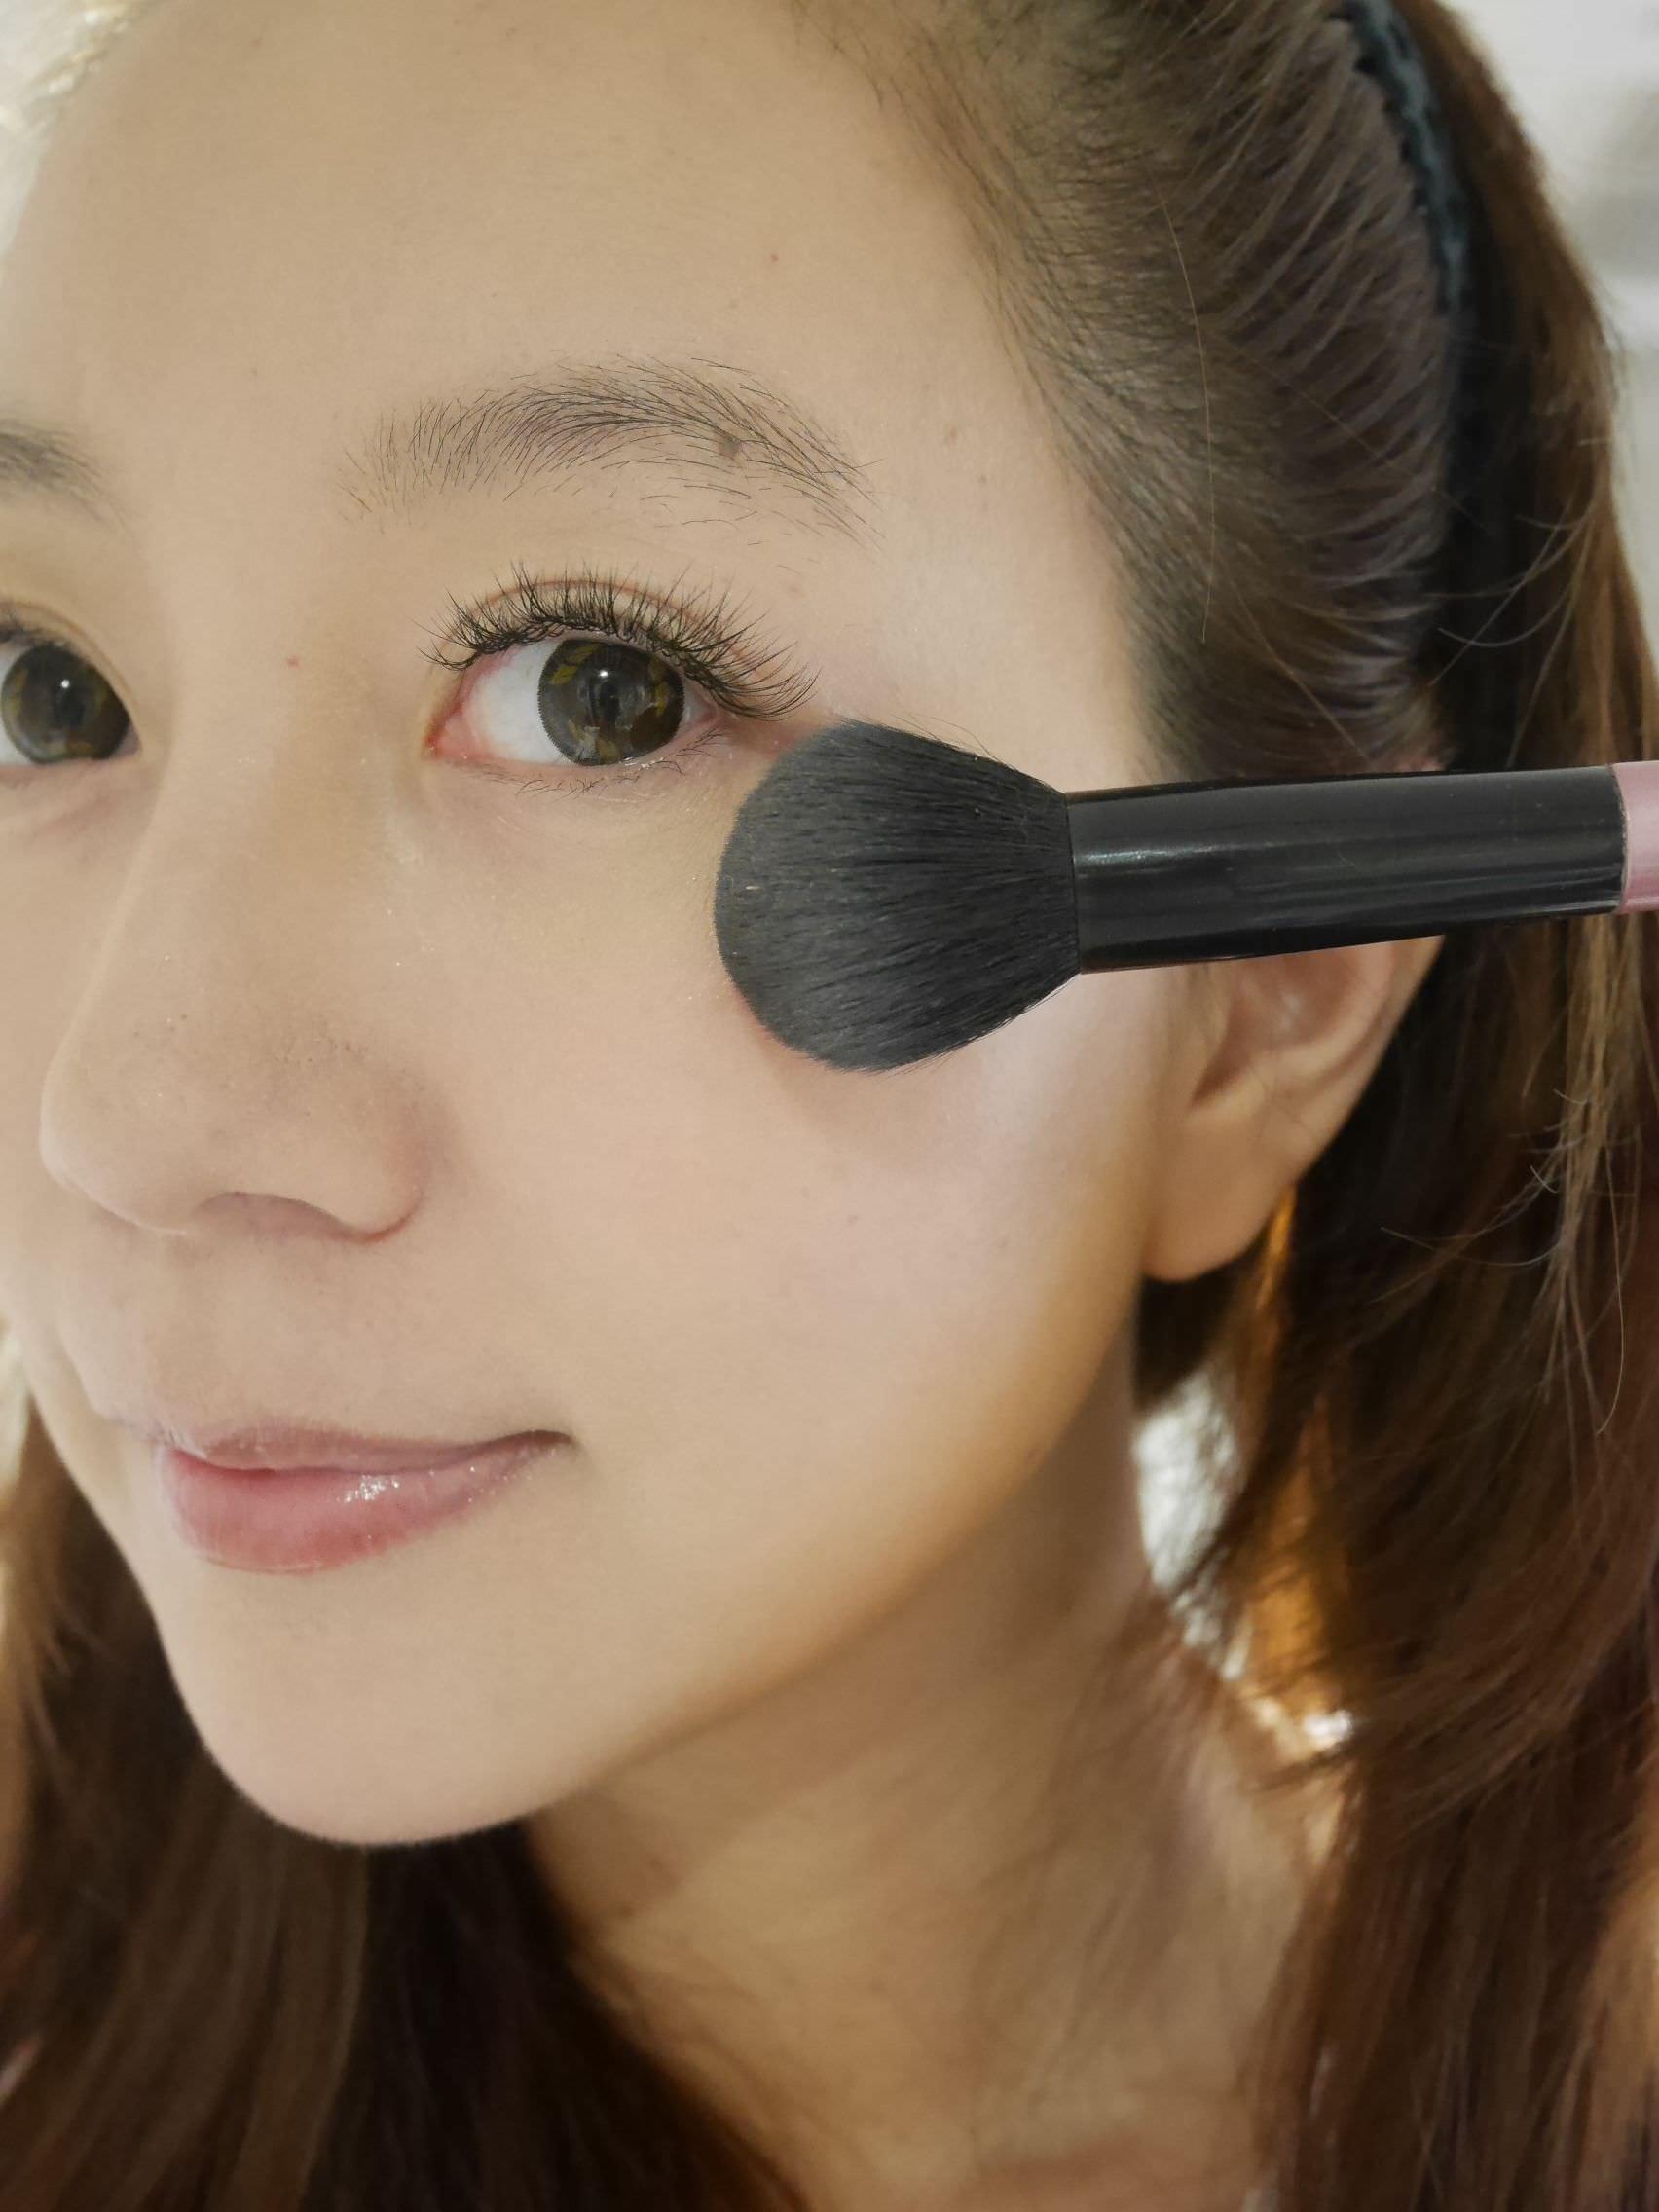 彩妝極短篇♥Too Faced cocoa contour♥超級小臉彩妝盤(≧∀≦)